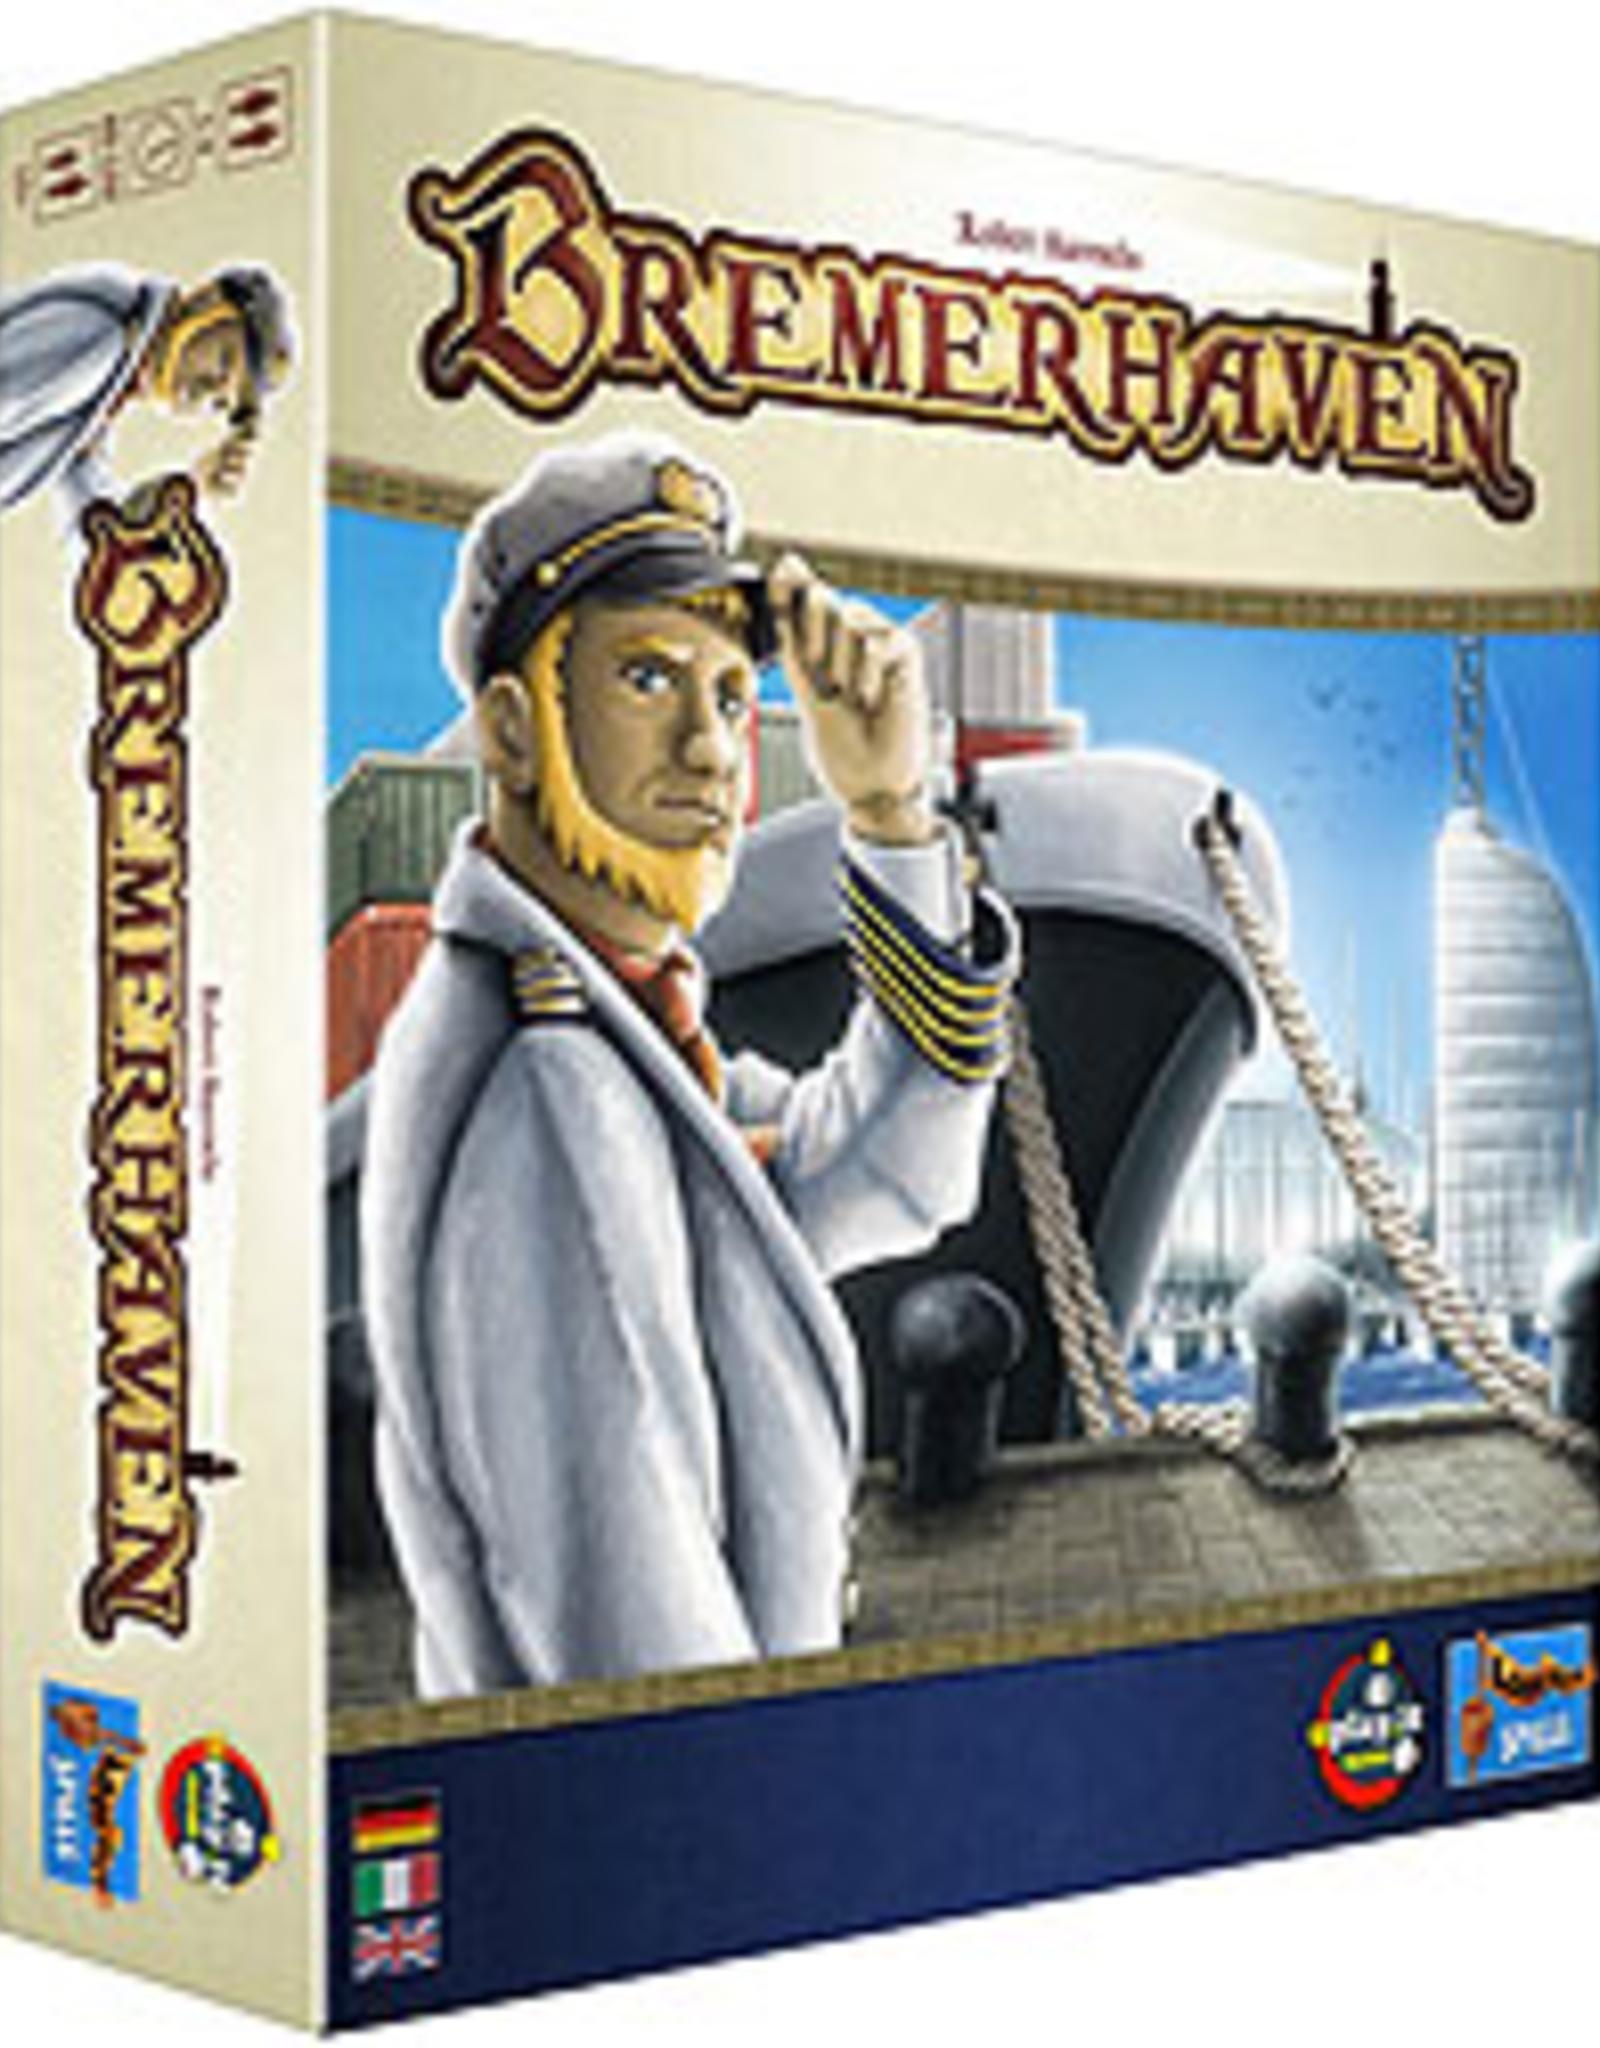 Lookout Games Bremerhaven